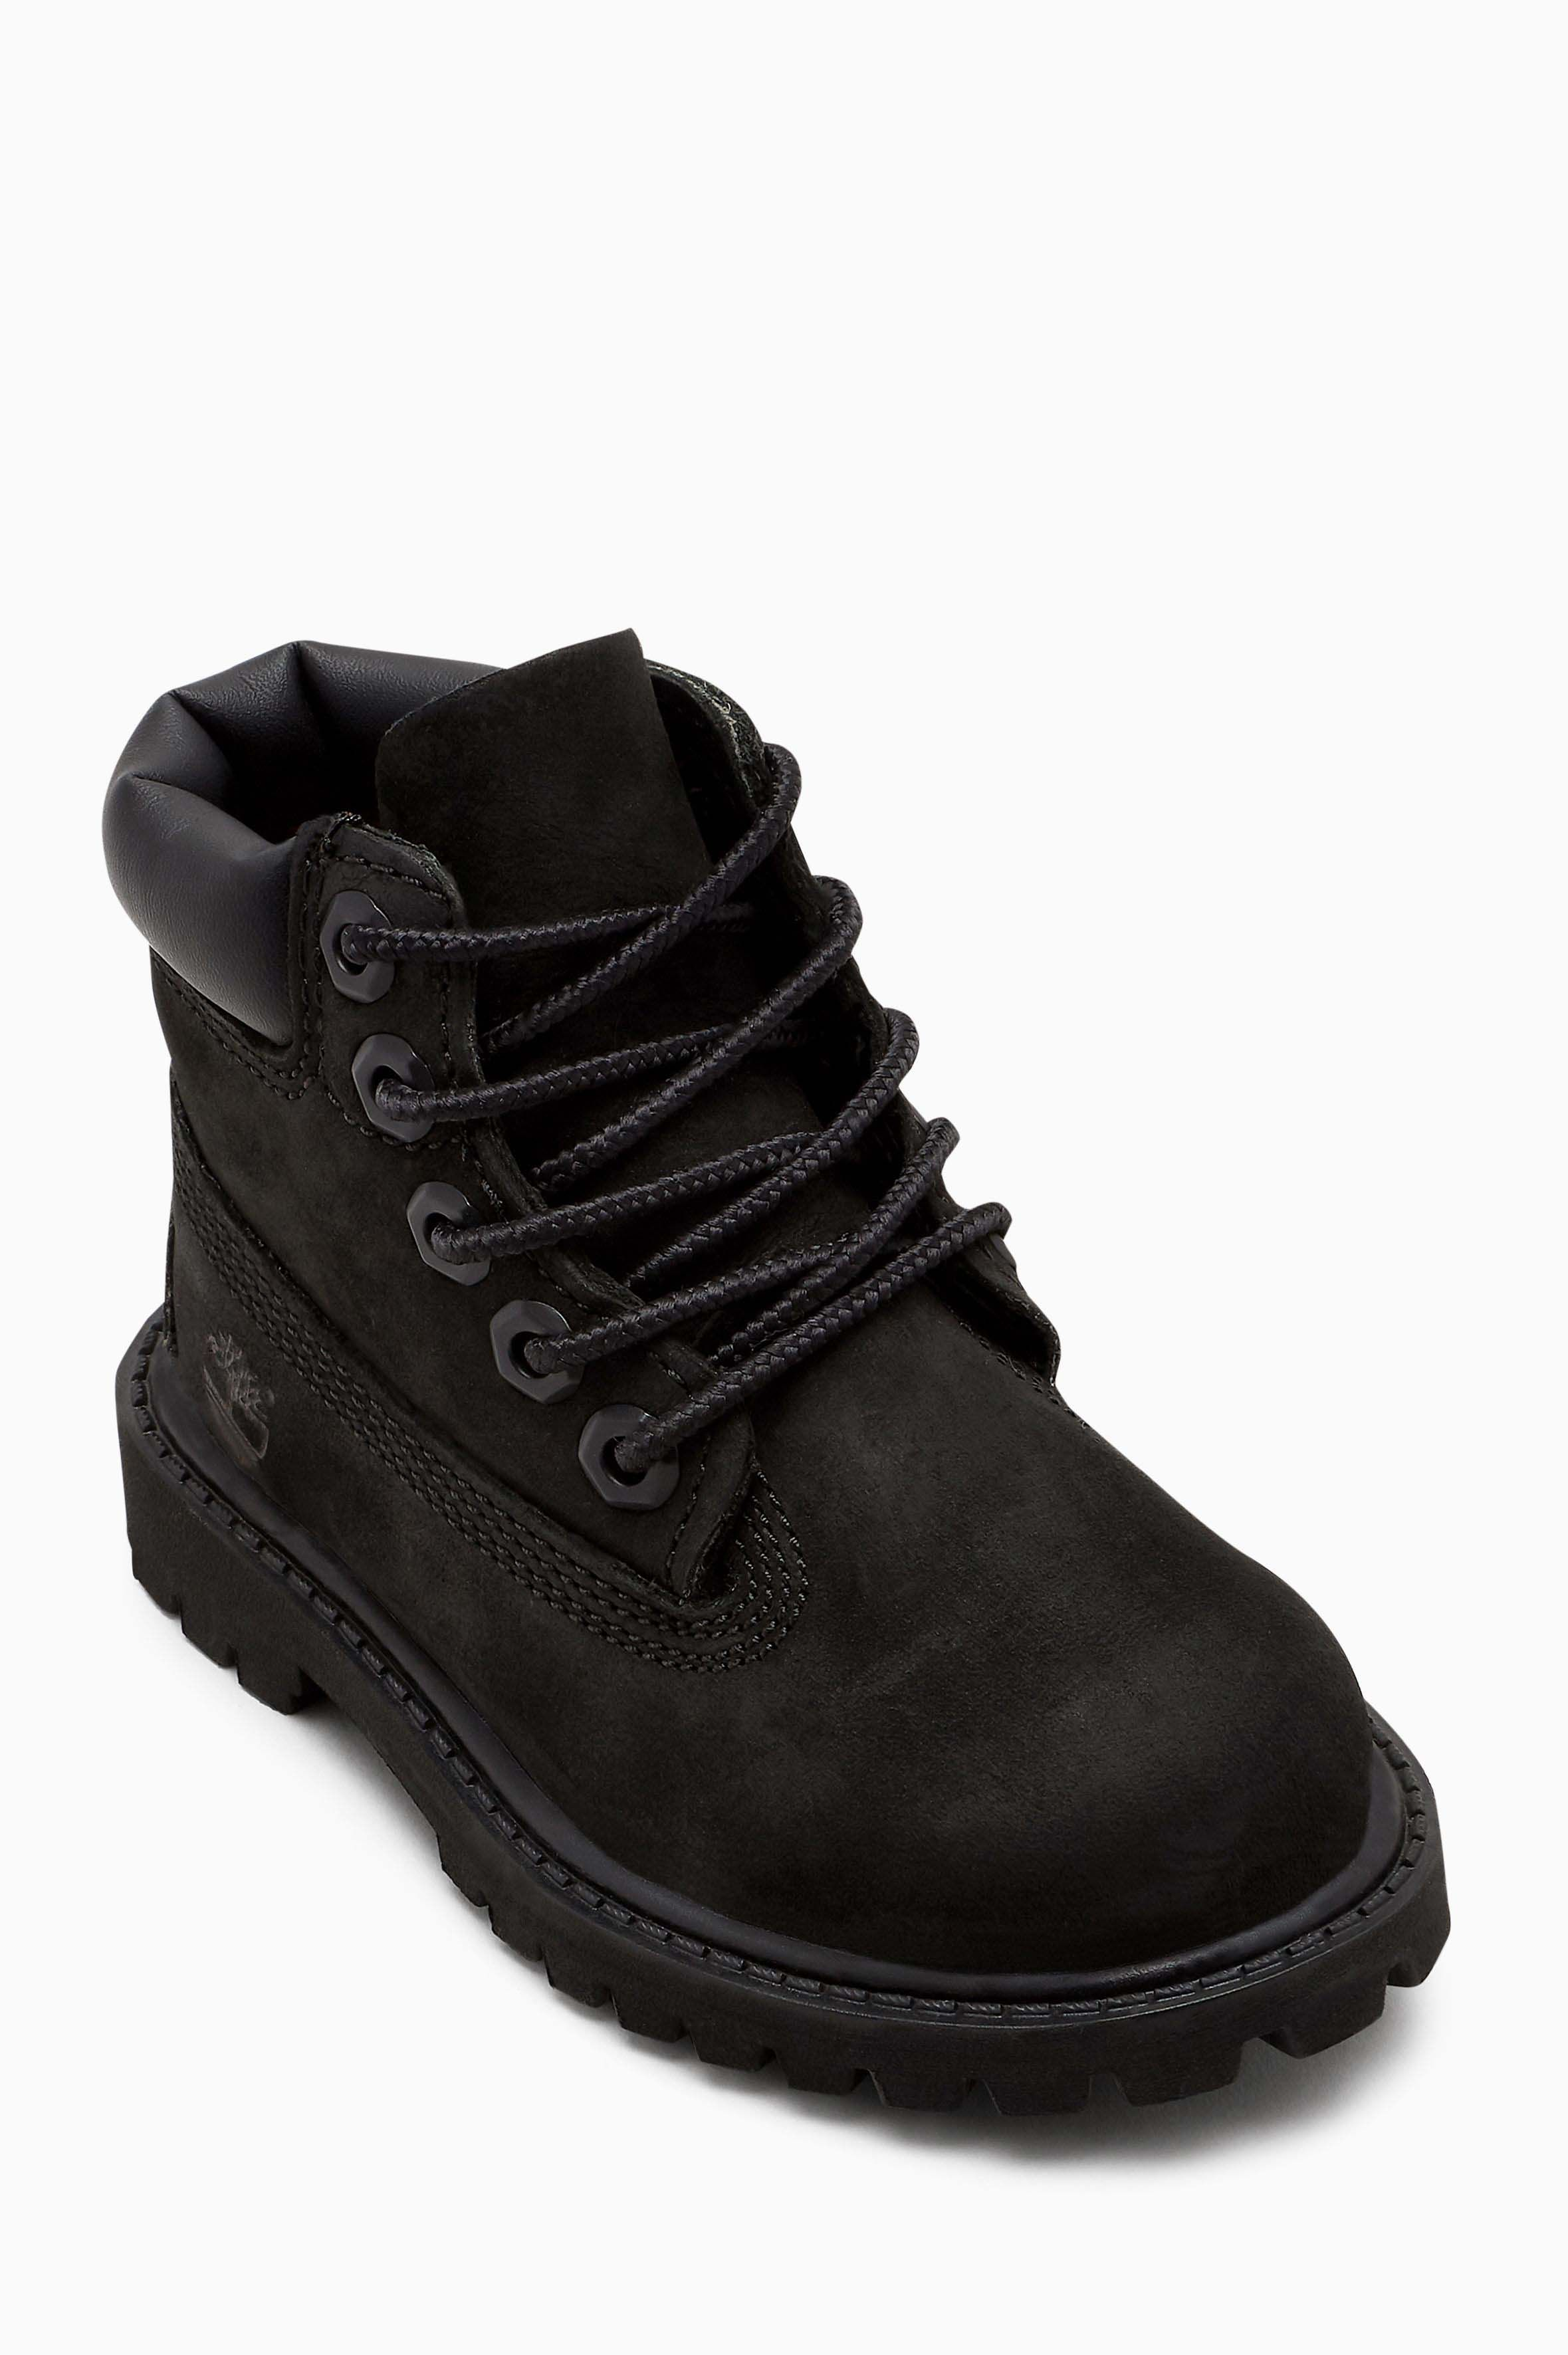 12675ac9dbb Boys Timberland Black 6 Inch Premium WP Boot - Black